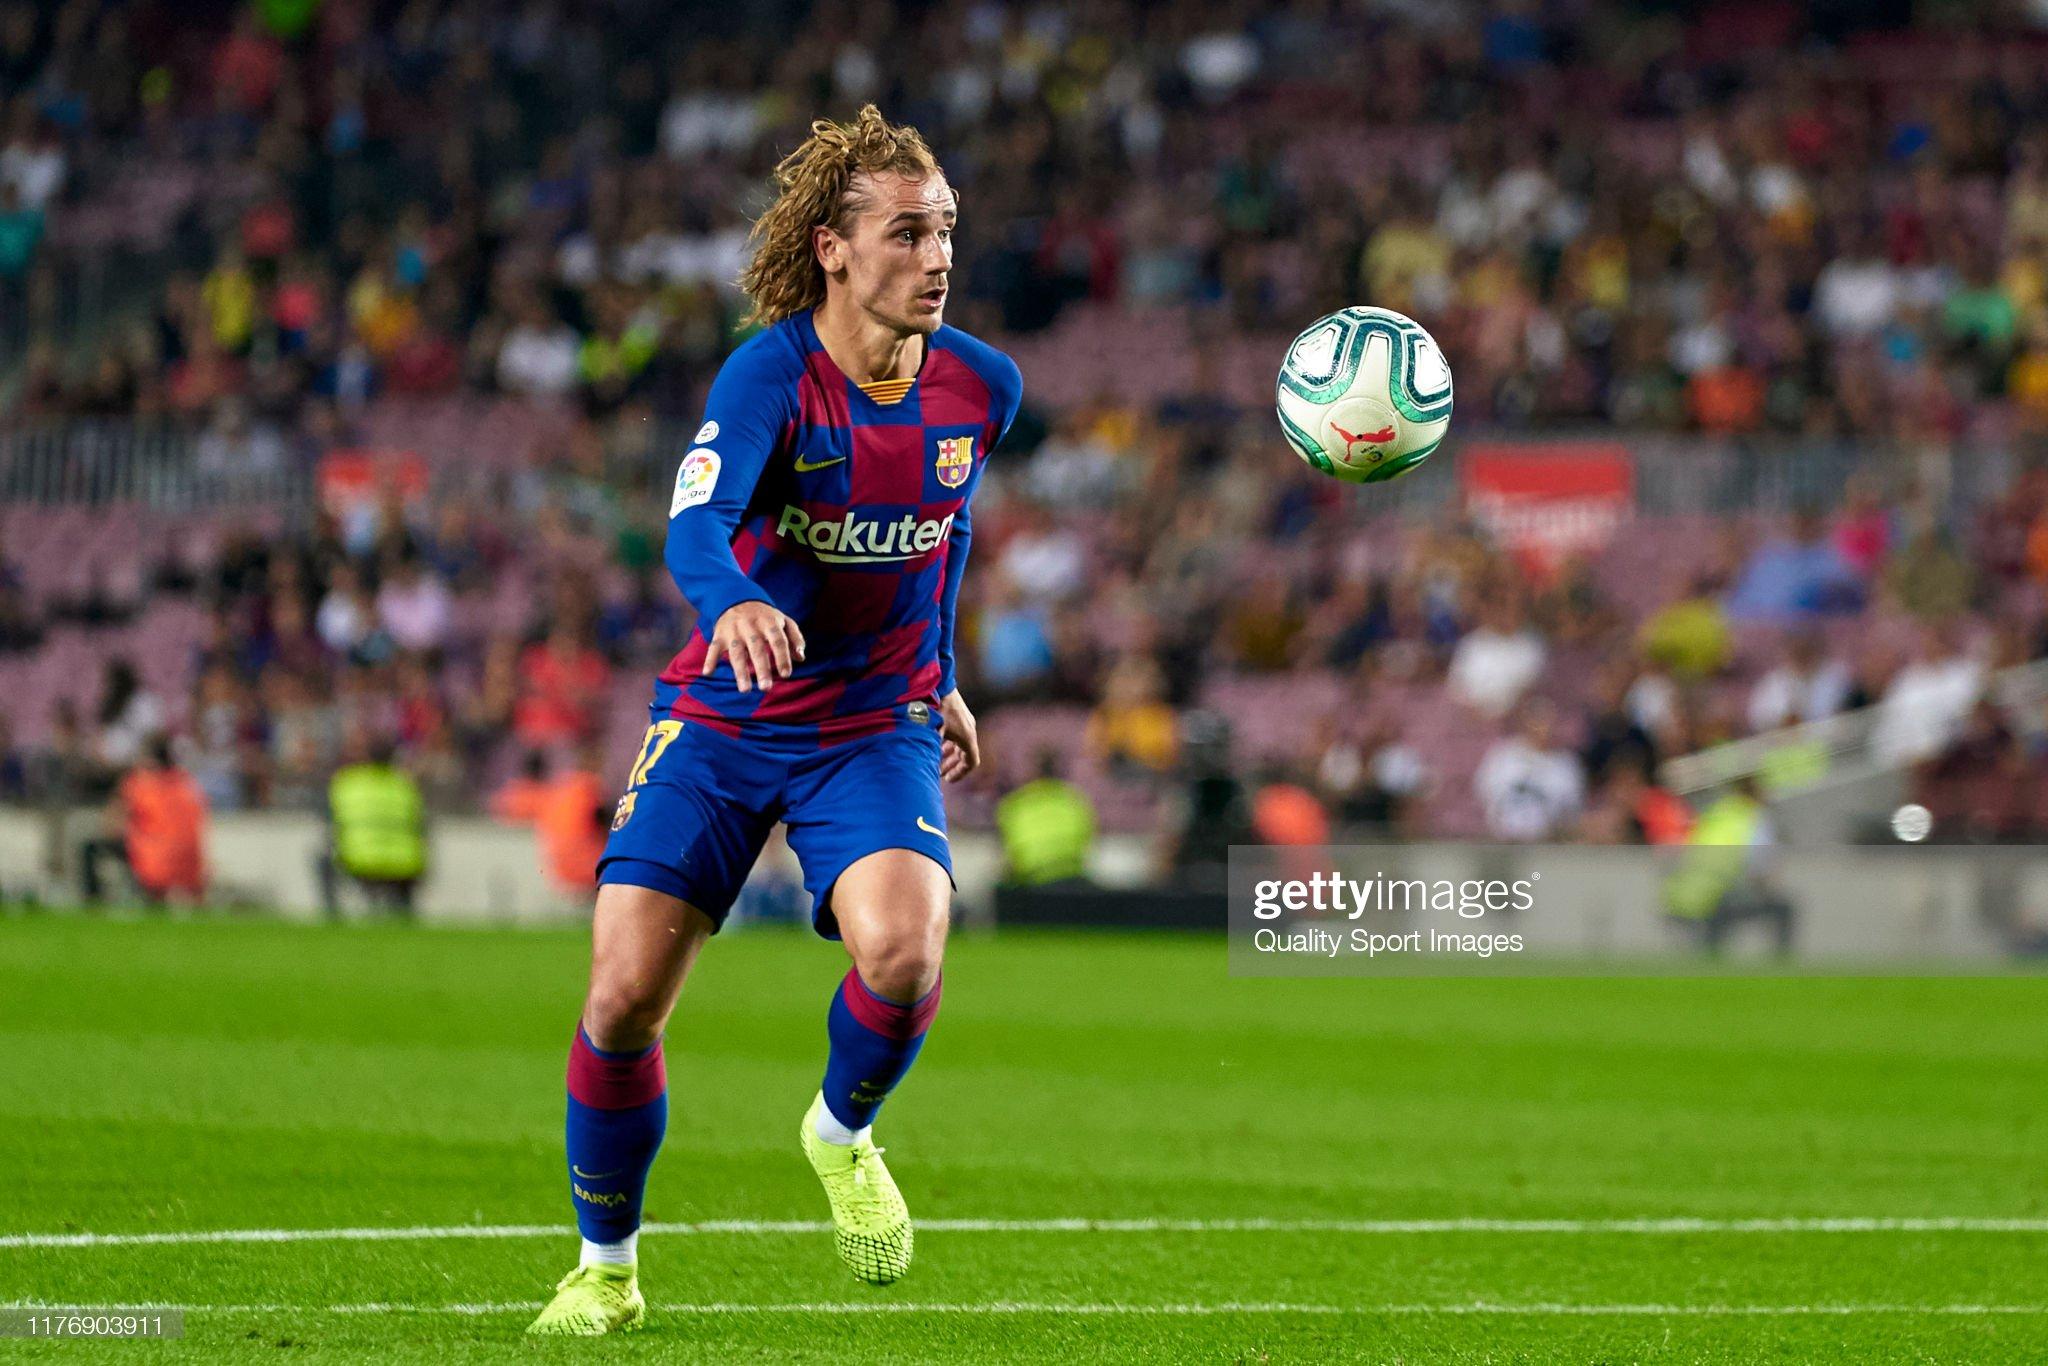 صور مباراة : برشلونة - فياريال 2-1 ( 24-09-2019 )  Antoine-griezmann-of-fc-barcelona-with-the-ball-during-the-liga-match-picture-id1176903911?s=2048x2048